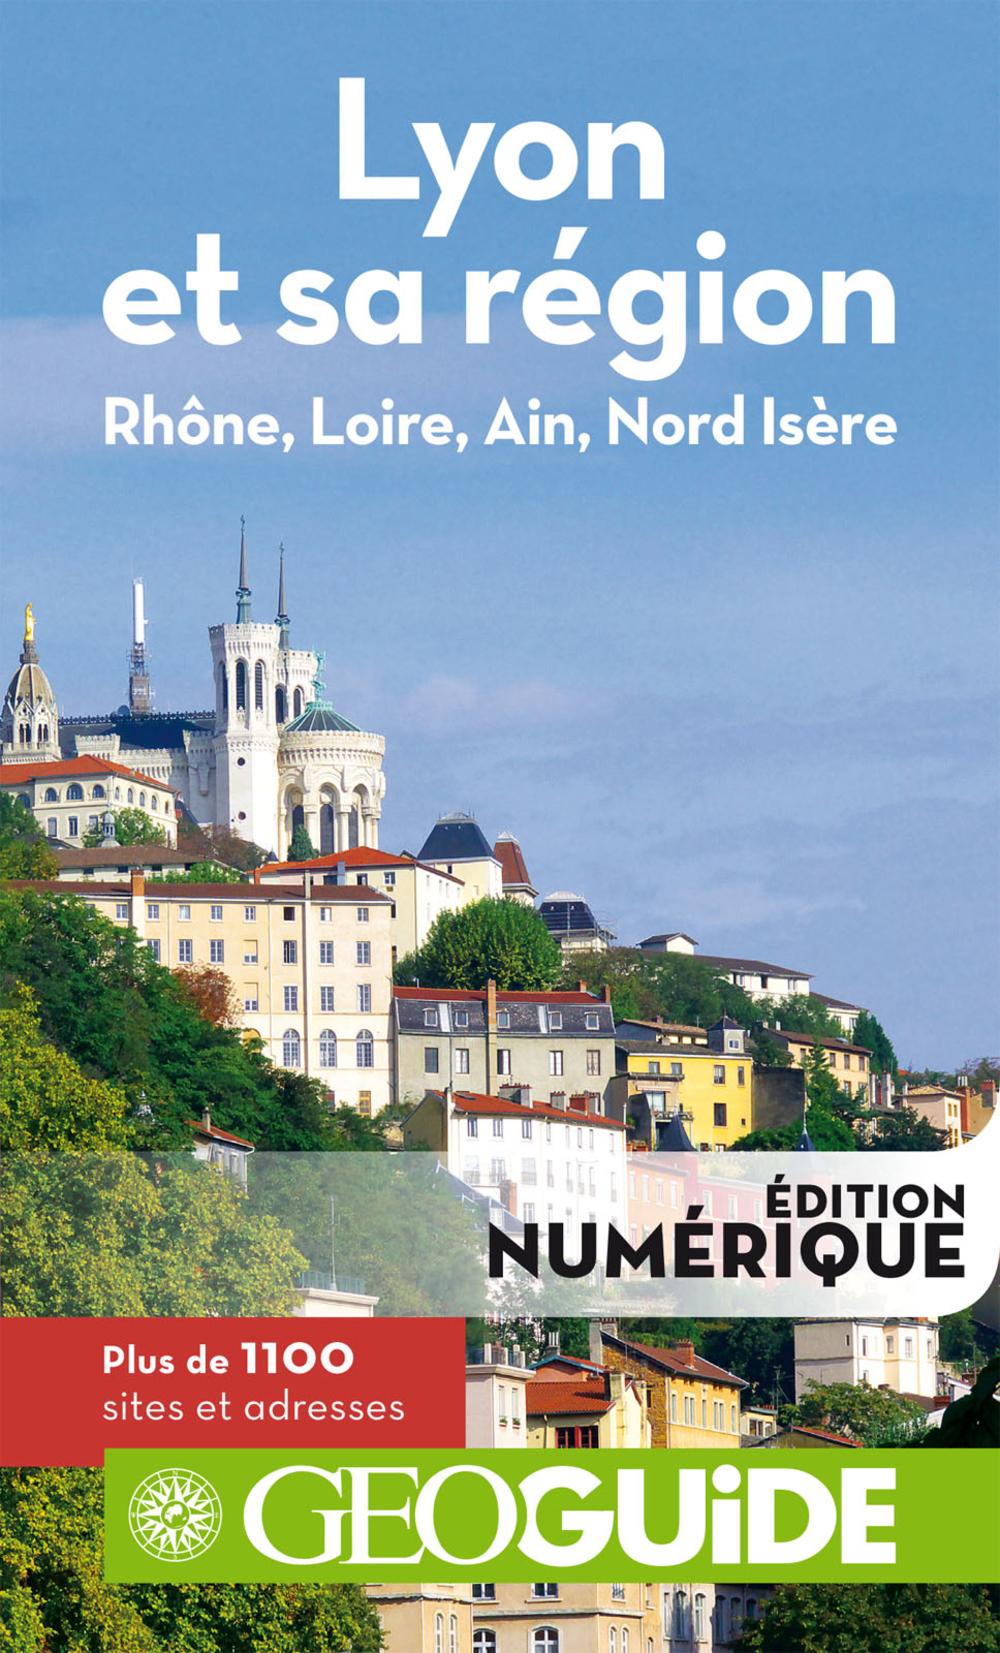 GEOguide Lyon et sa région. Rhône, Loire, Ain, Nord Isère |